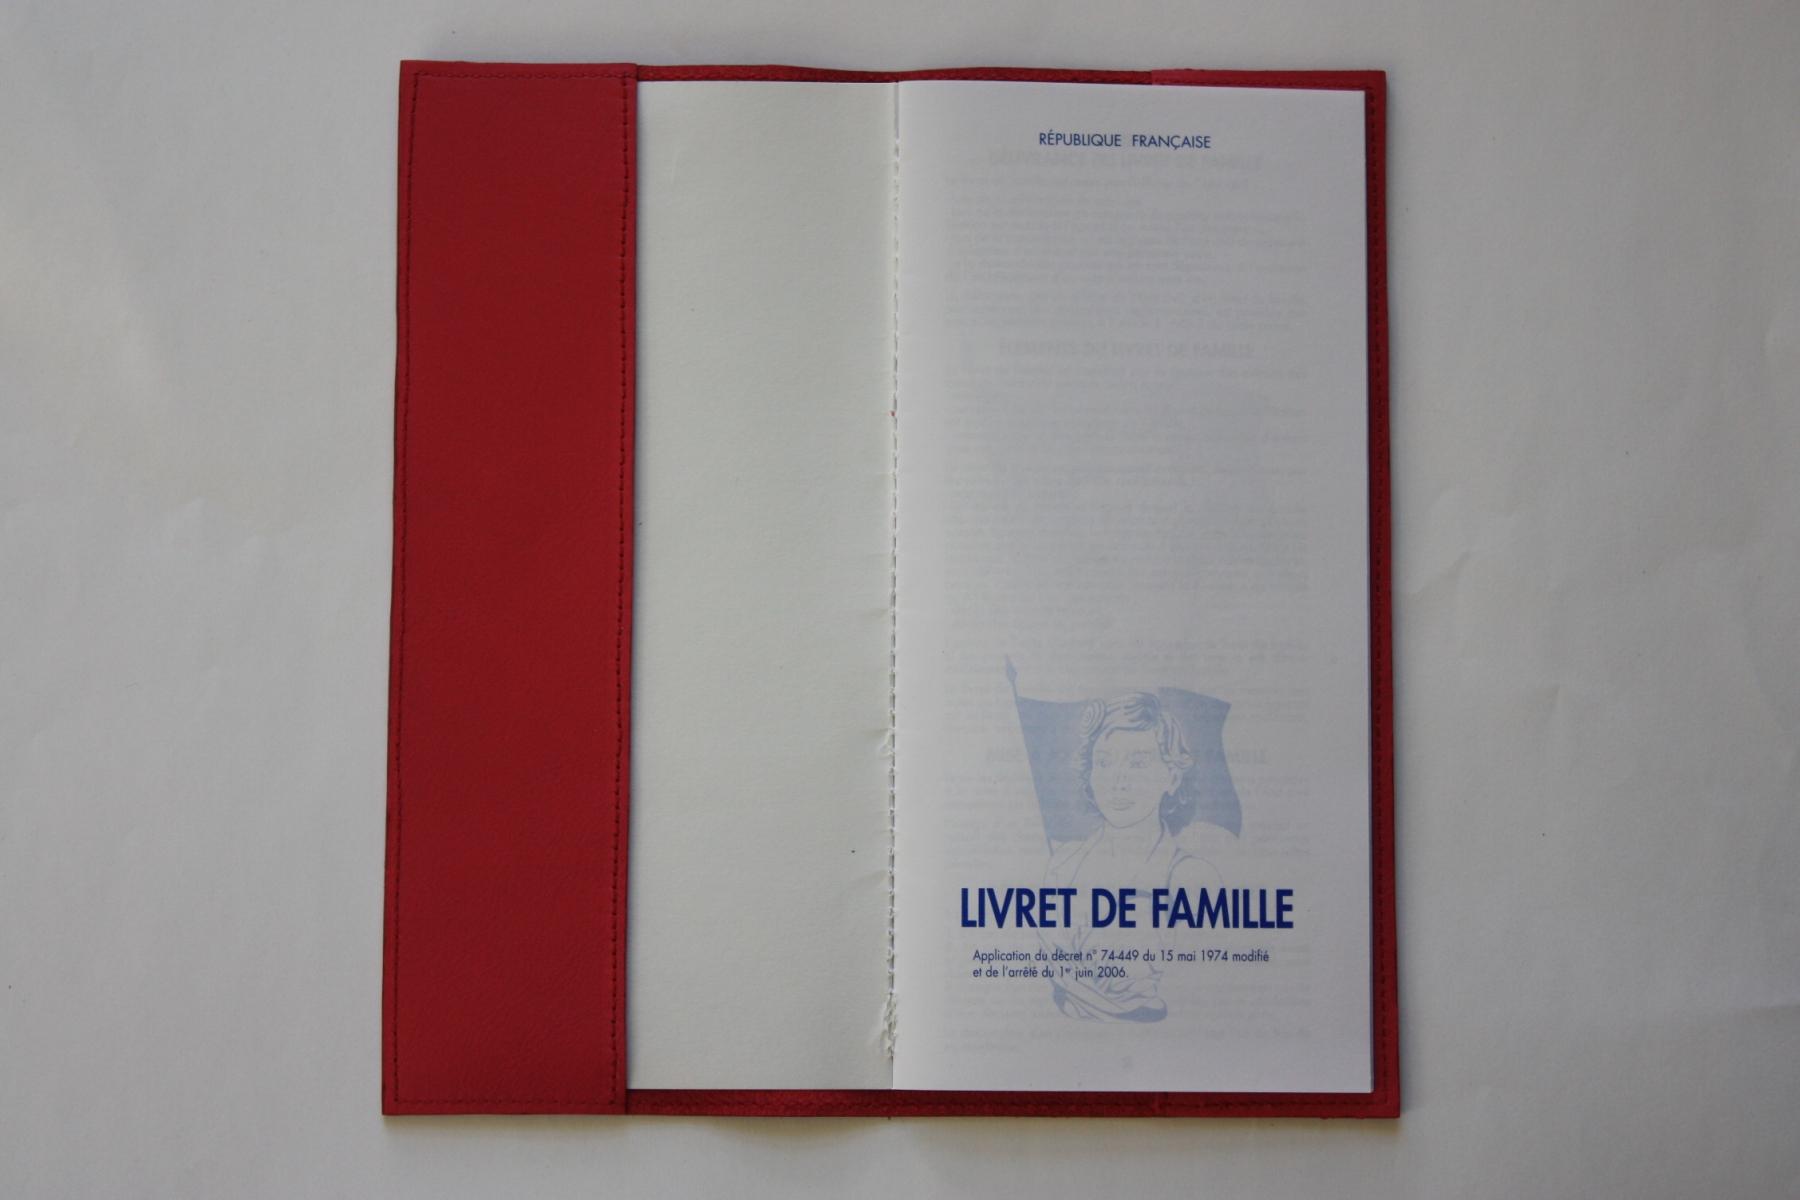 protège livret de famille 2